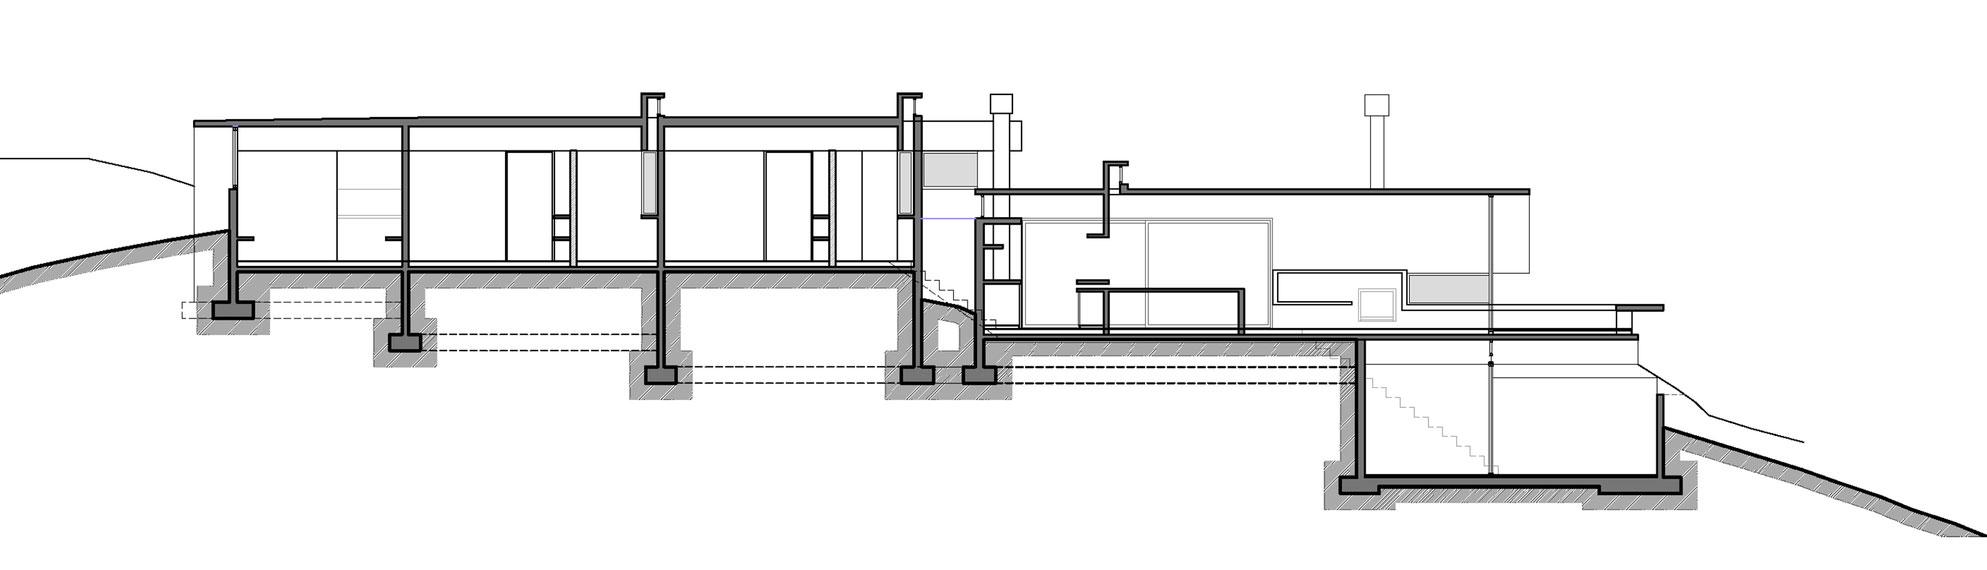 Wein House by Besonias Almeida Arquitectos-22